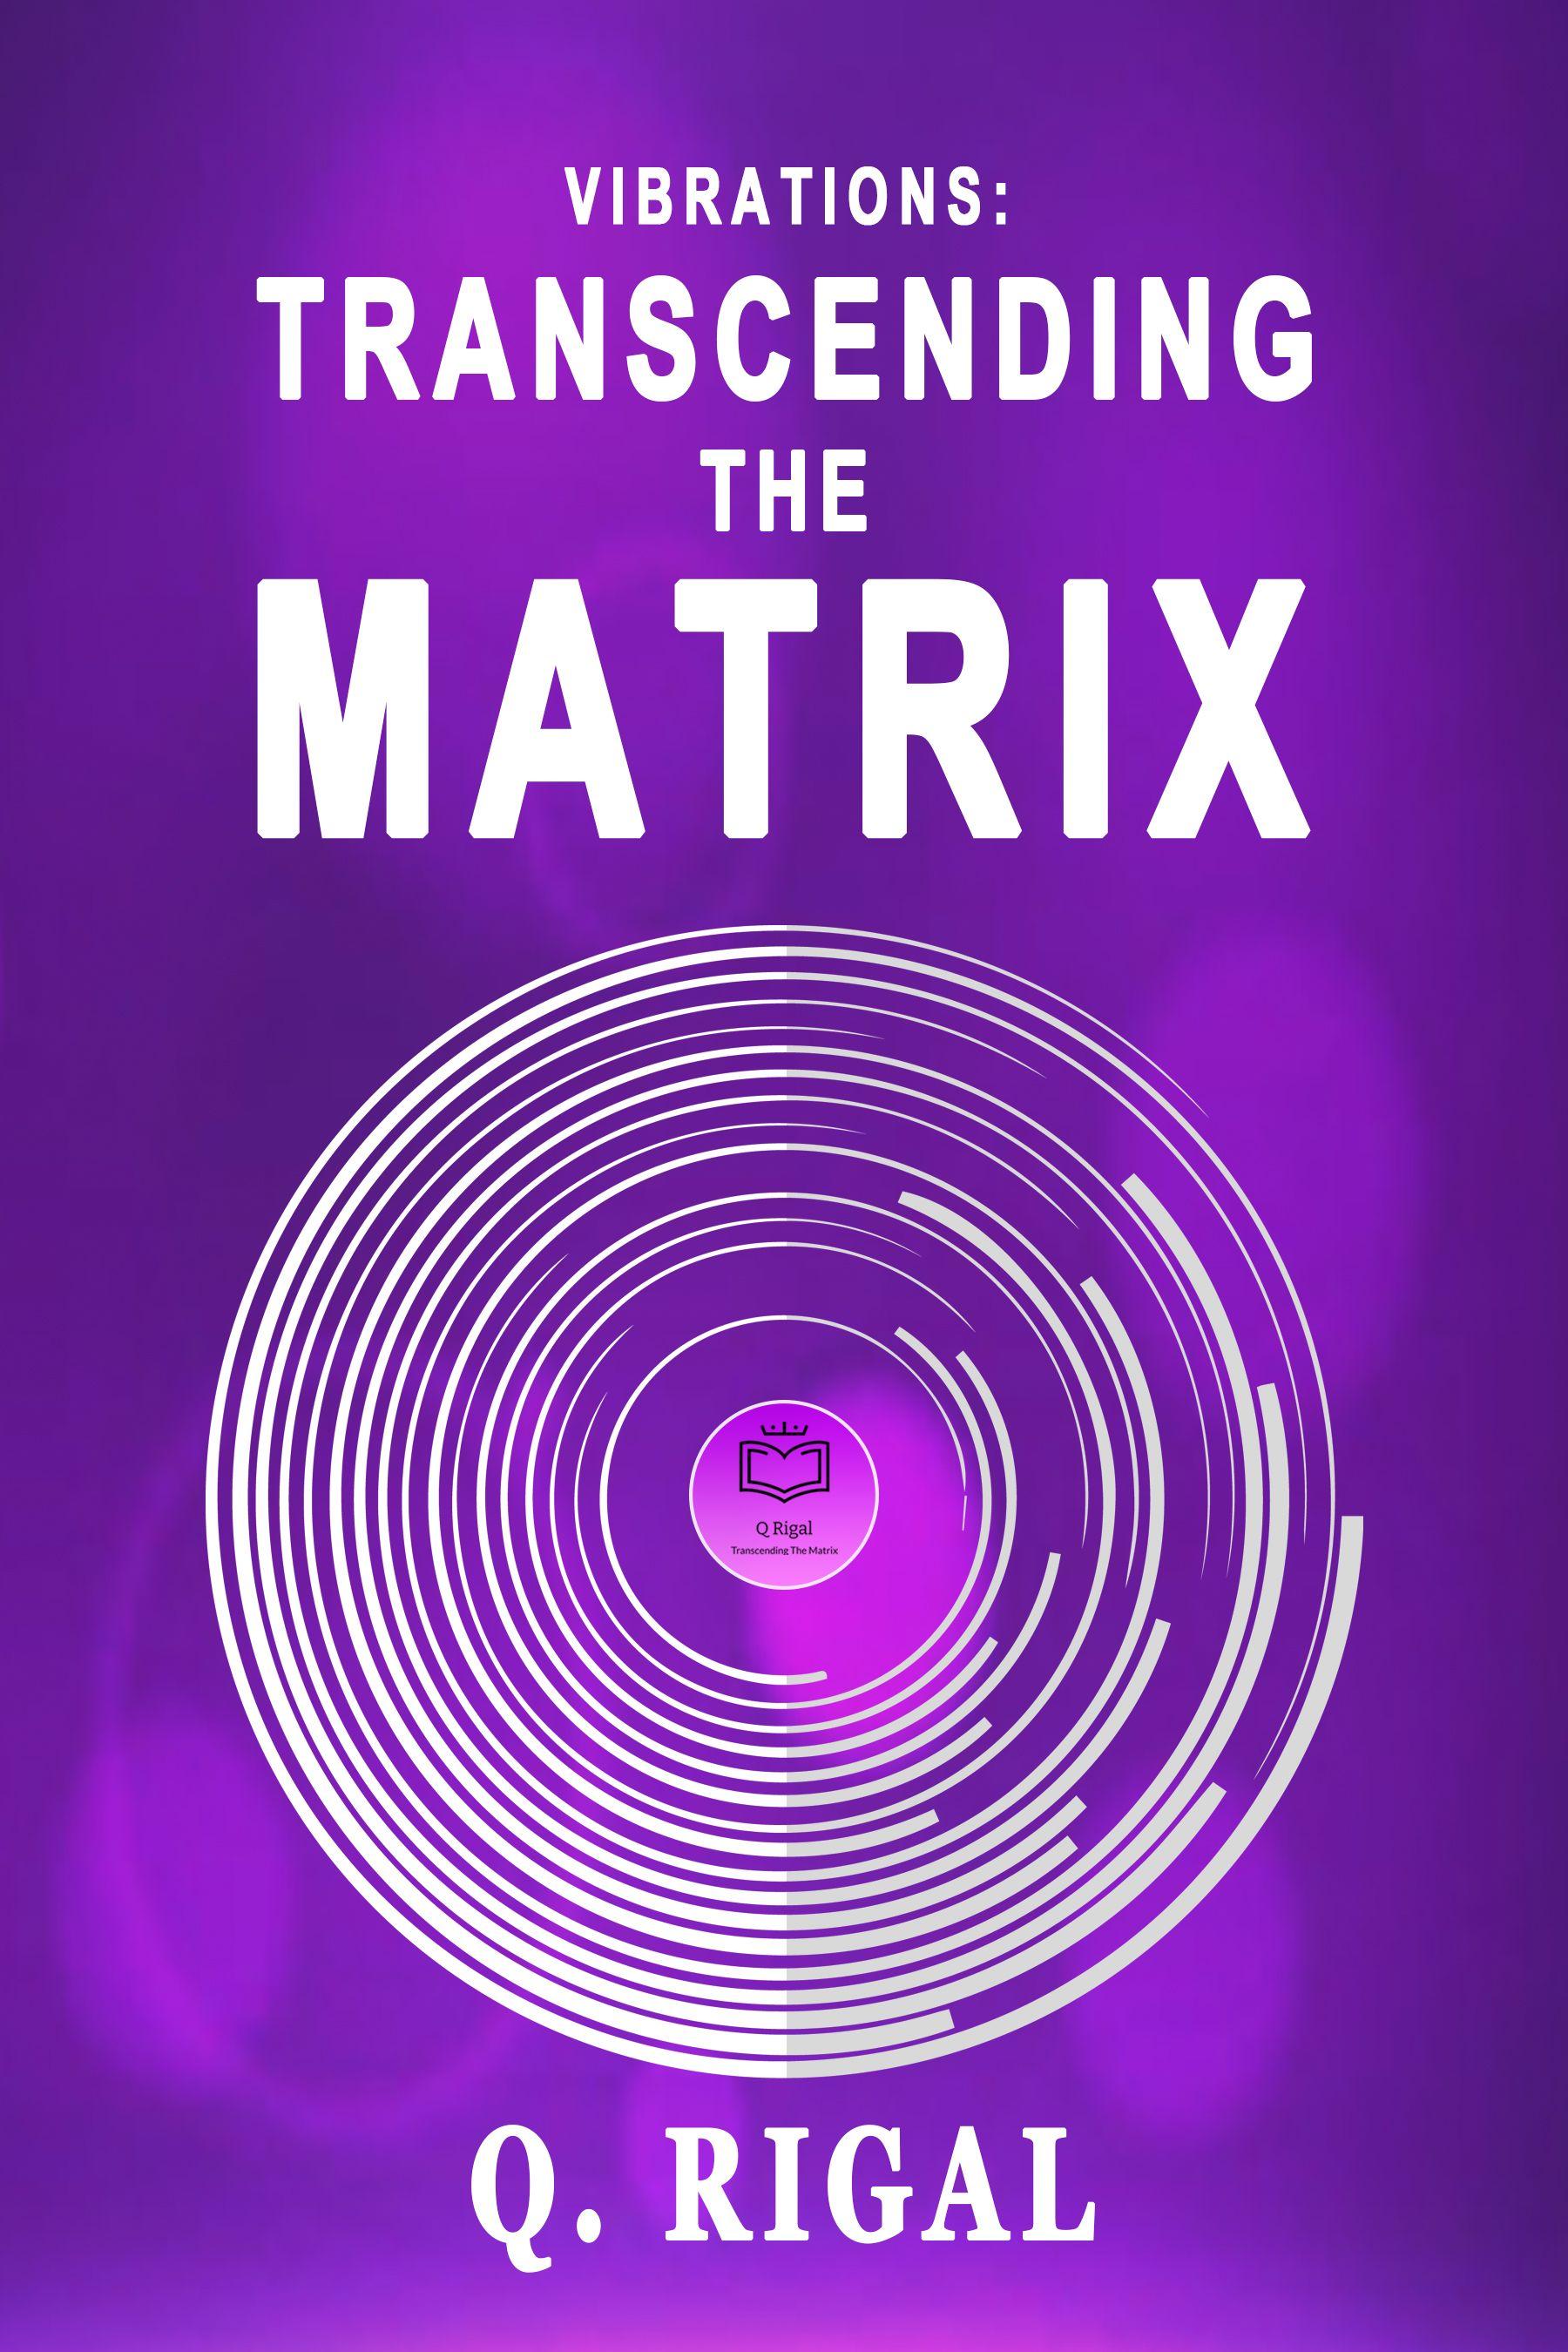 VIBRATIONS: Transcending The Matrix's Book Image